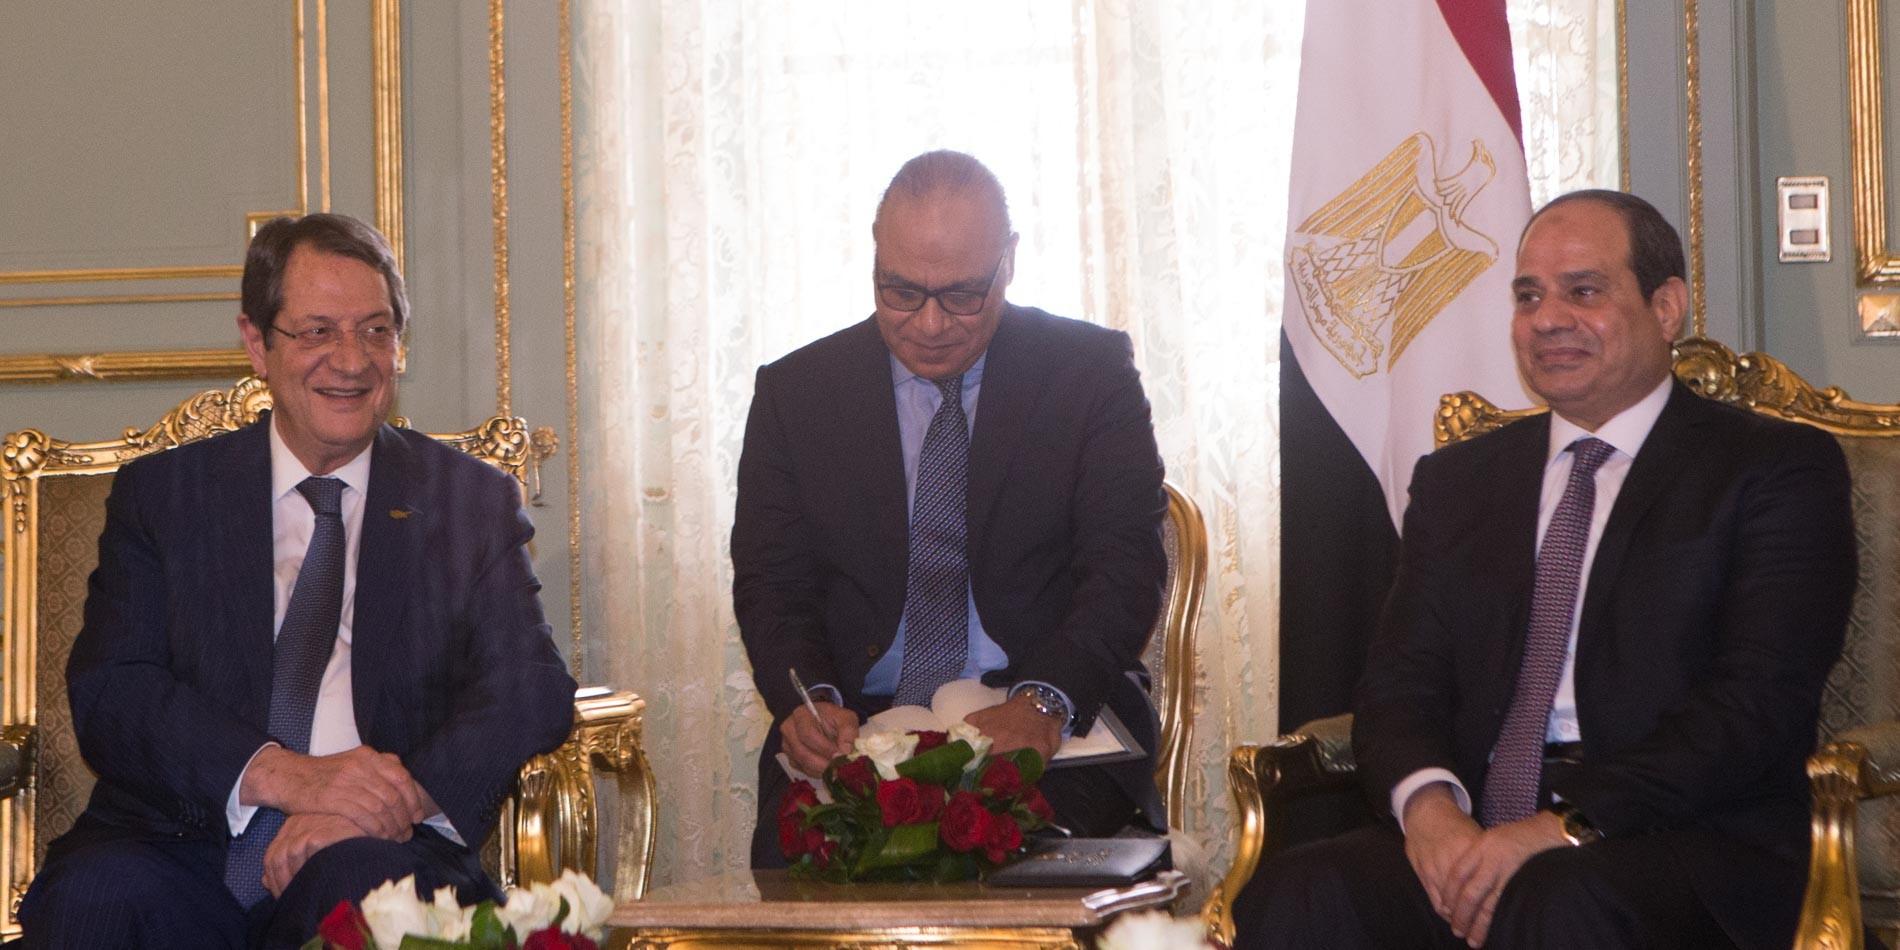 President Anastasiades met with the President of Egypt